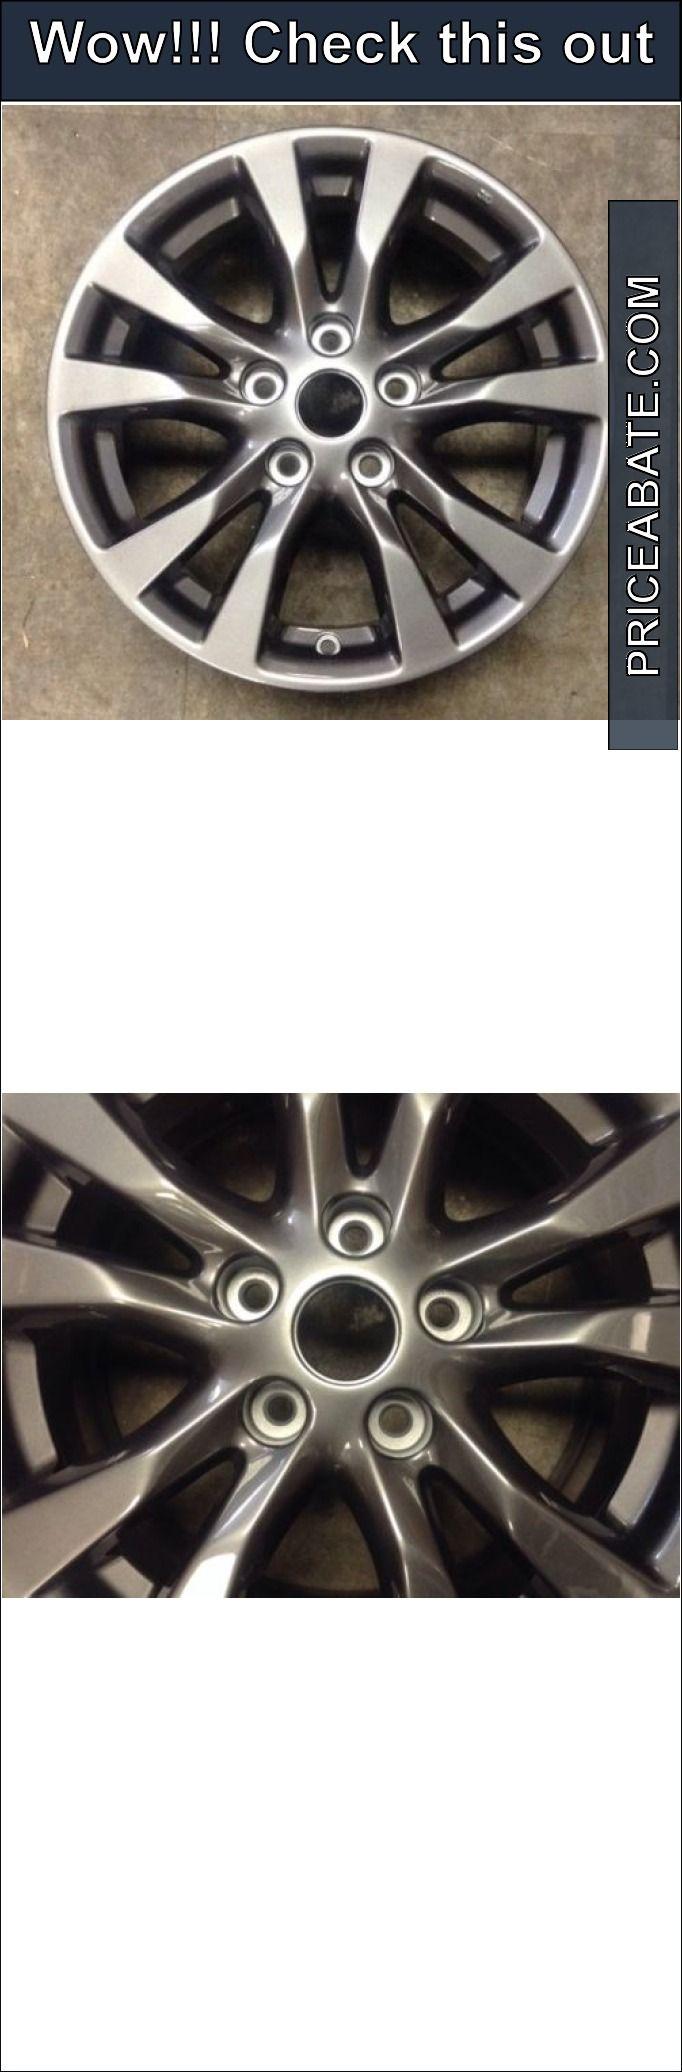 Auto parts general nissan altima 2014 98931 aluminum charcoal oem wheel rim 16